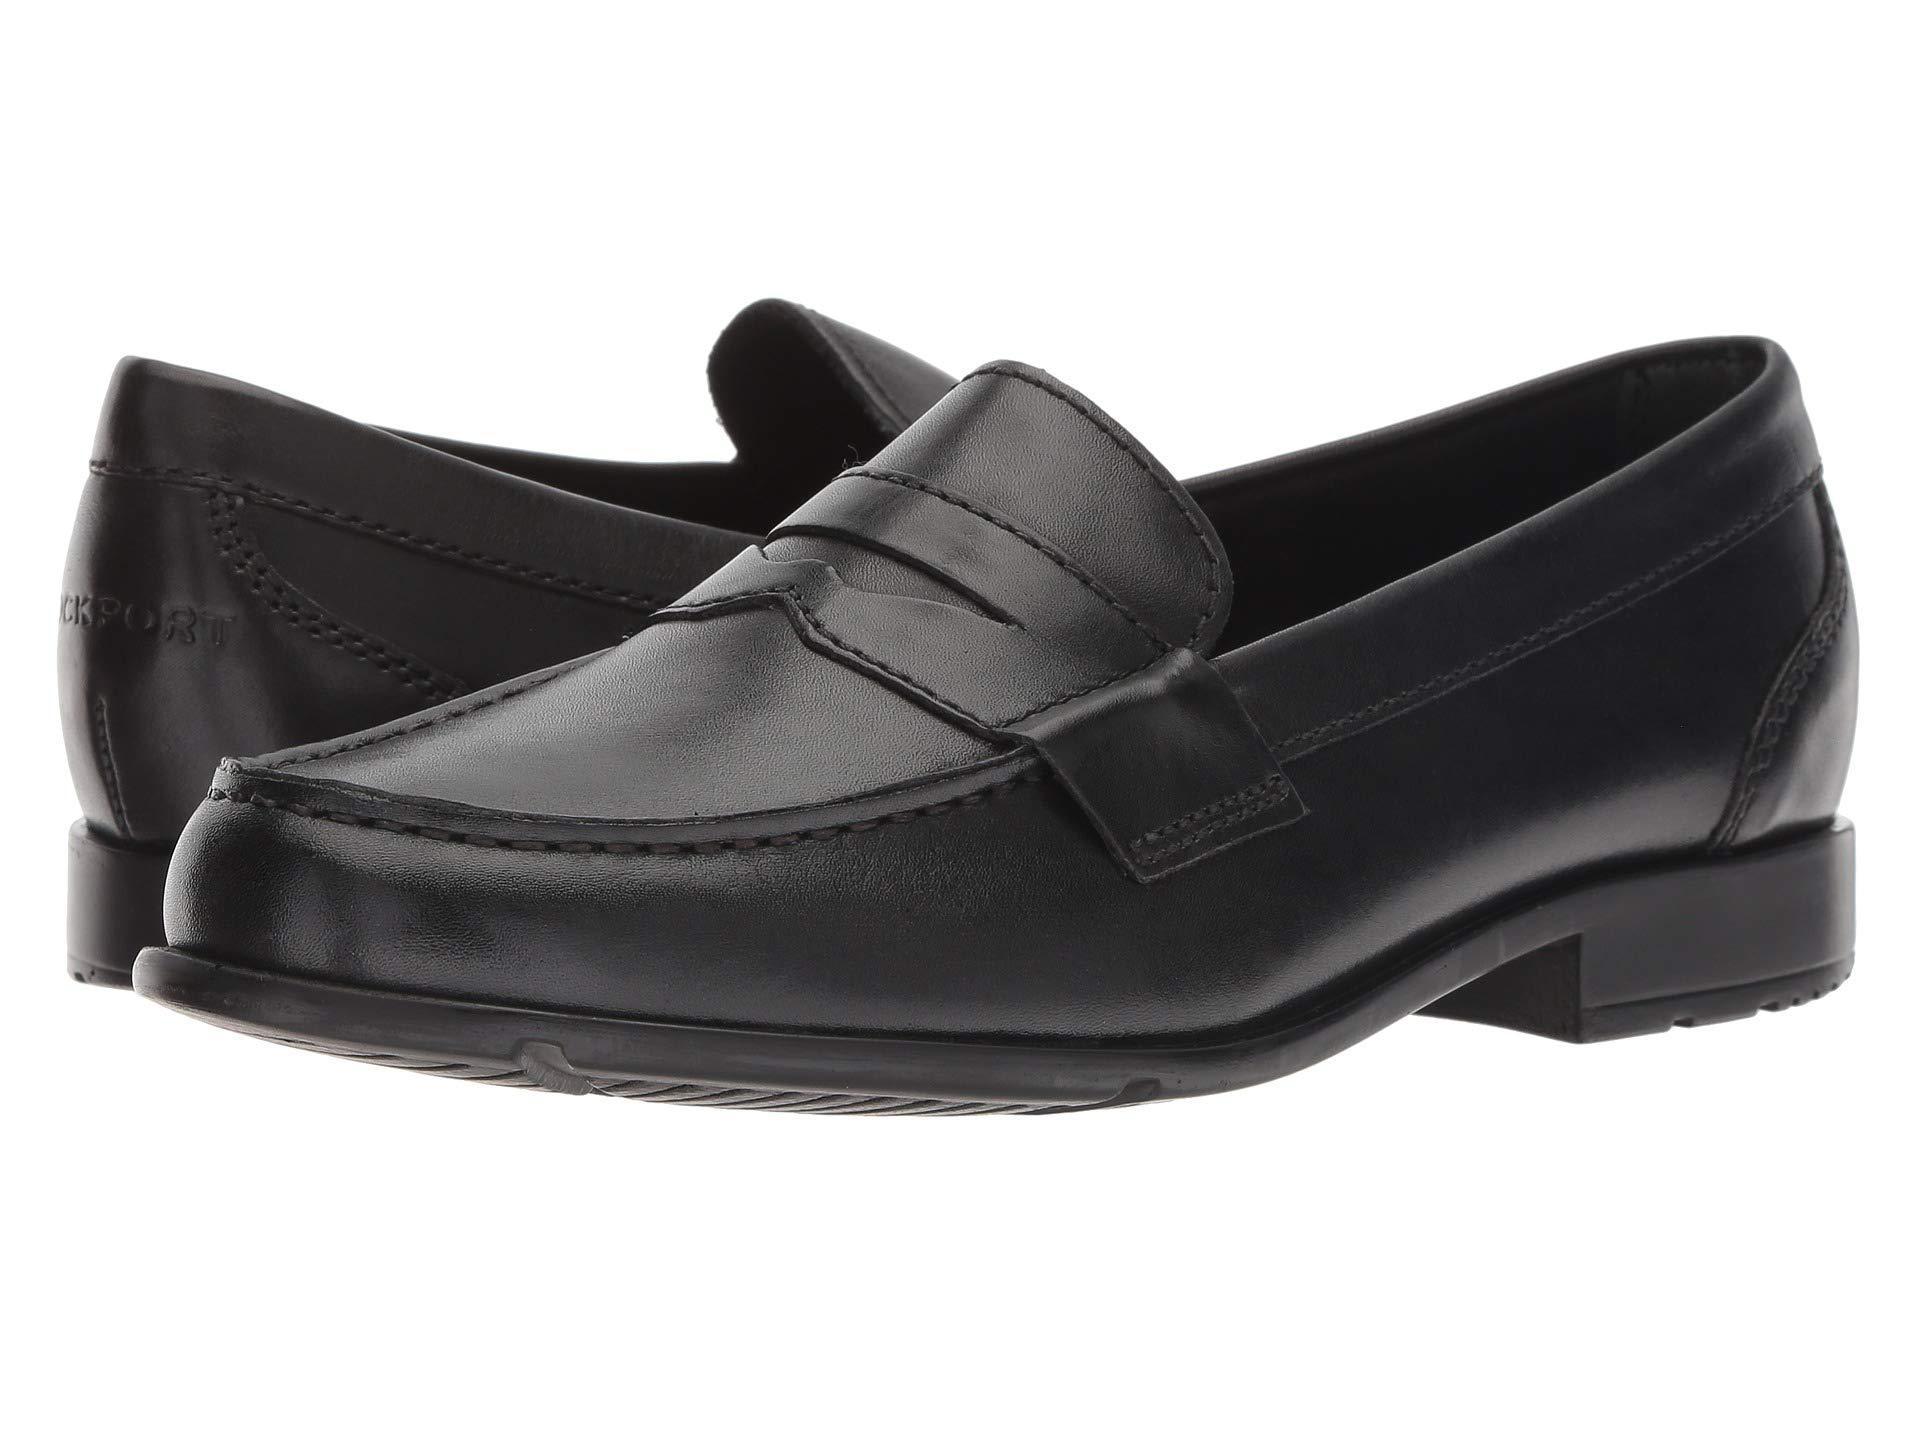 92252cceac7 Lyst - Rockport Classic Loafer Lite Penny (dark Brown1) Men s Slip ...